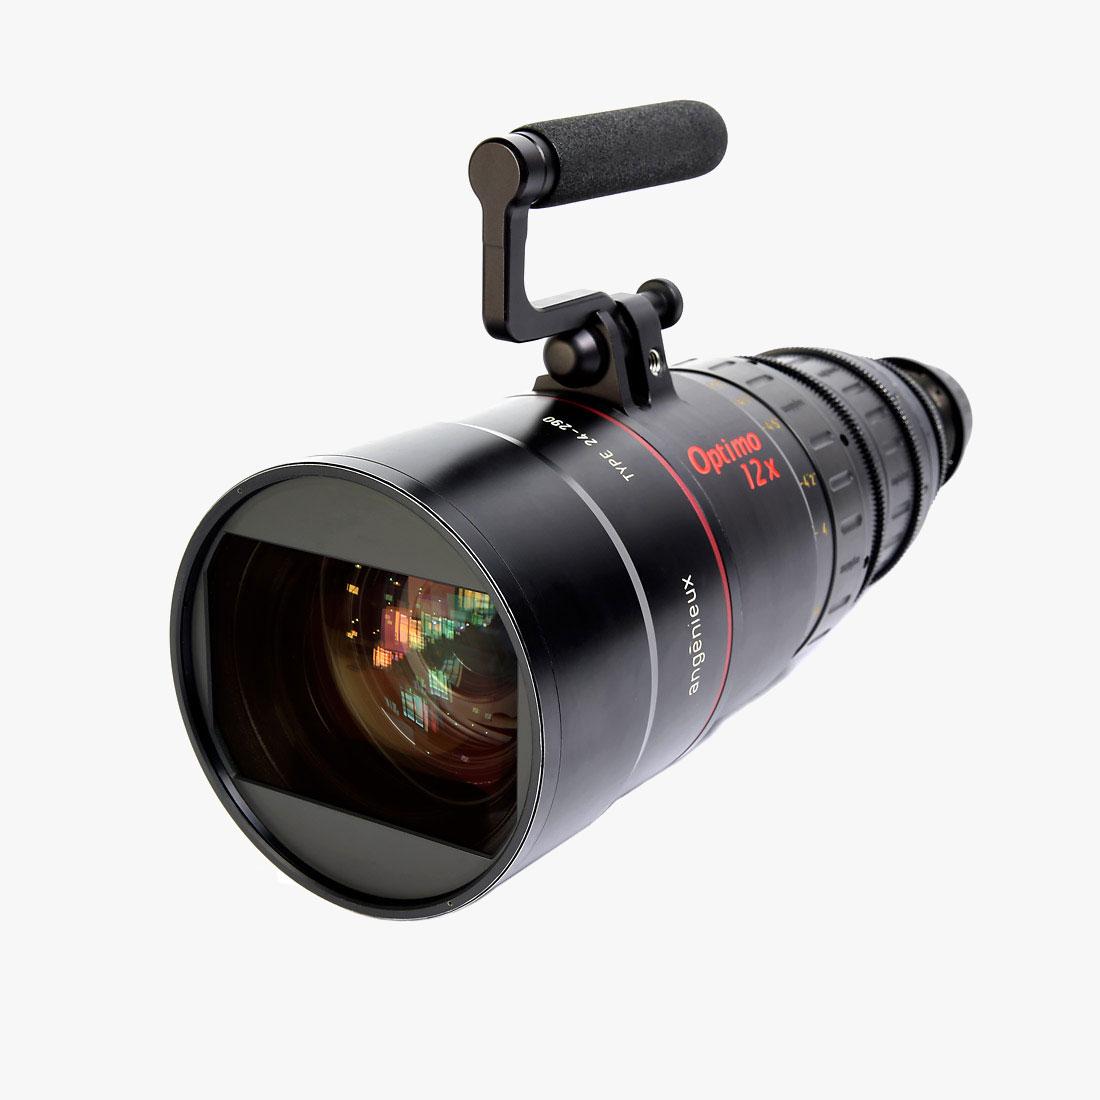 pl-camera-zooms